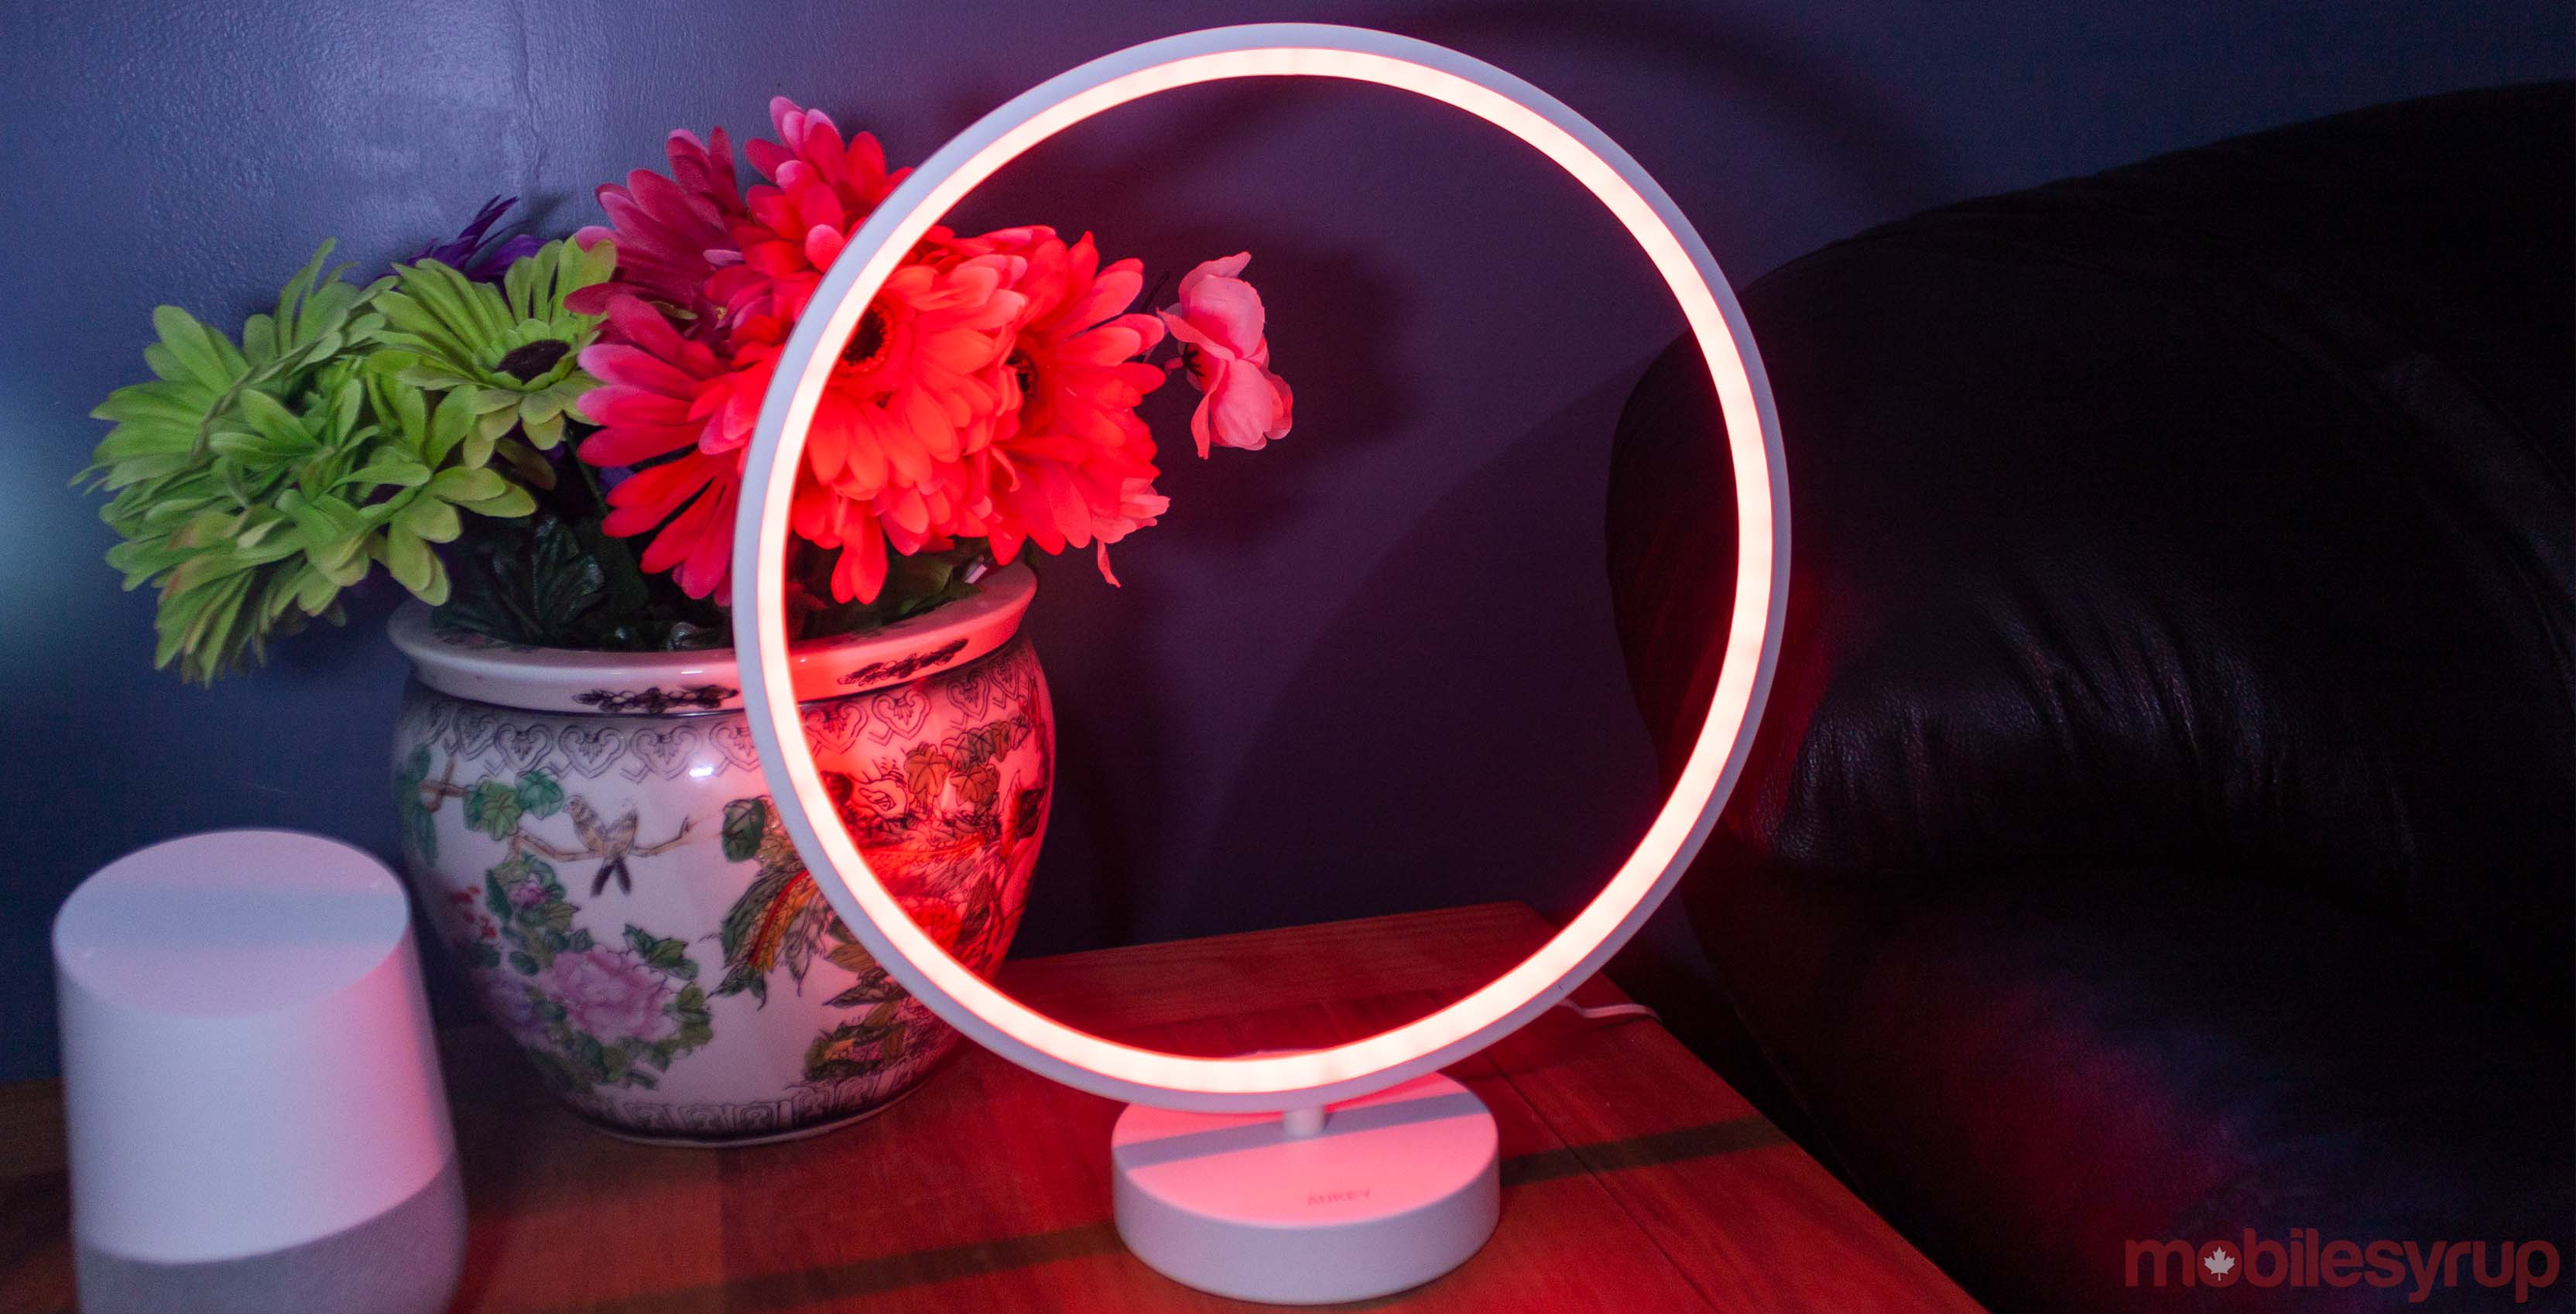 Aukey Aura light